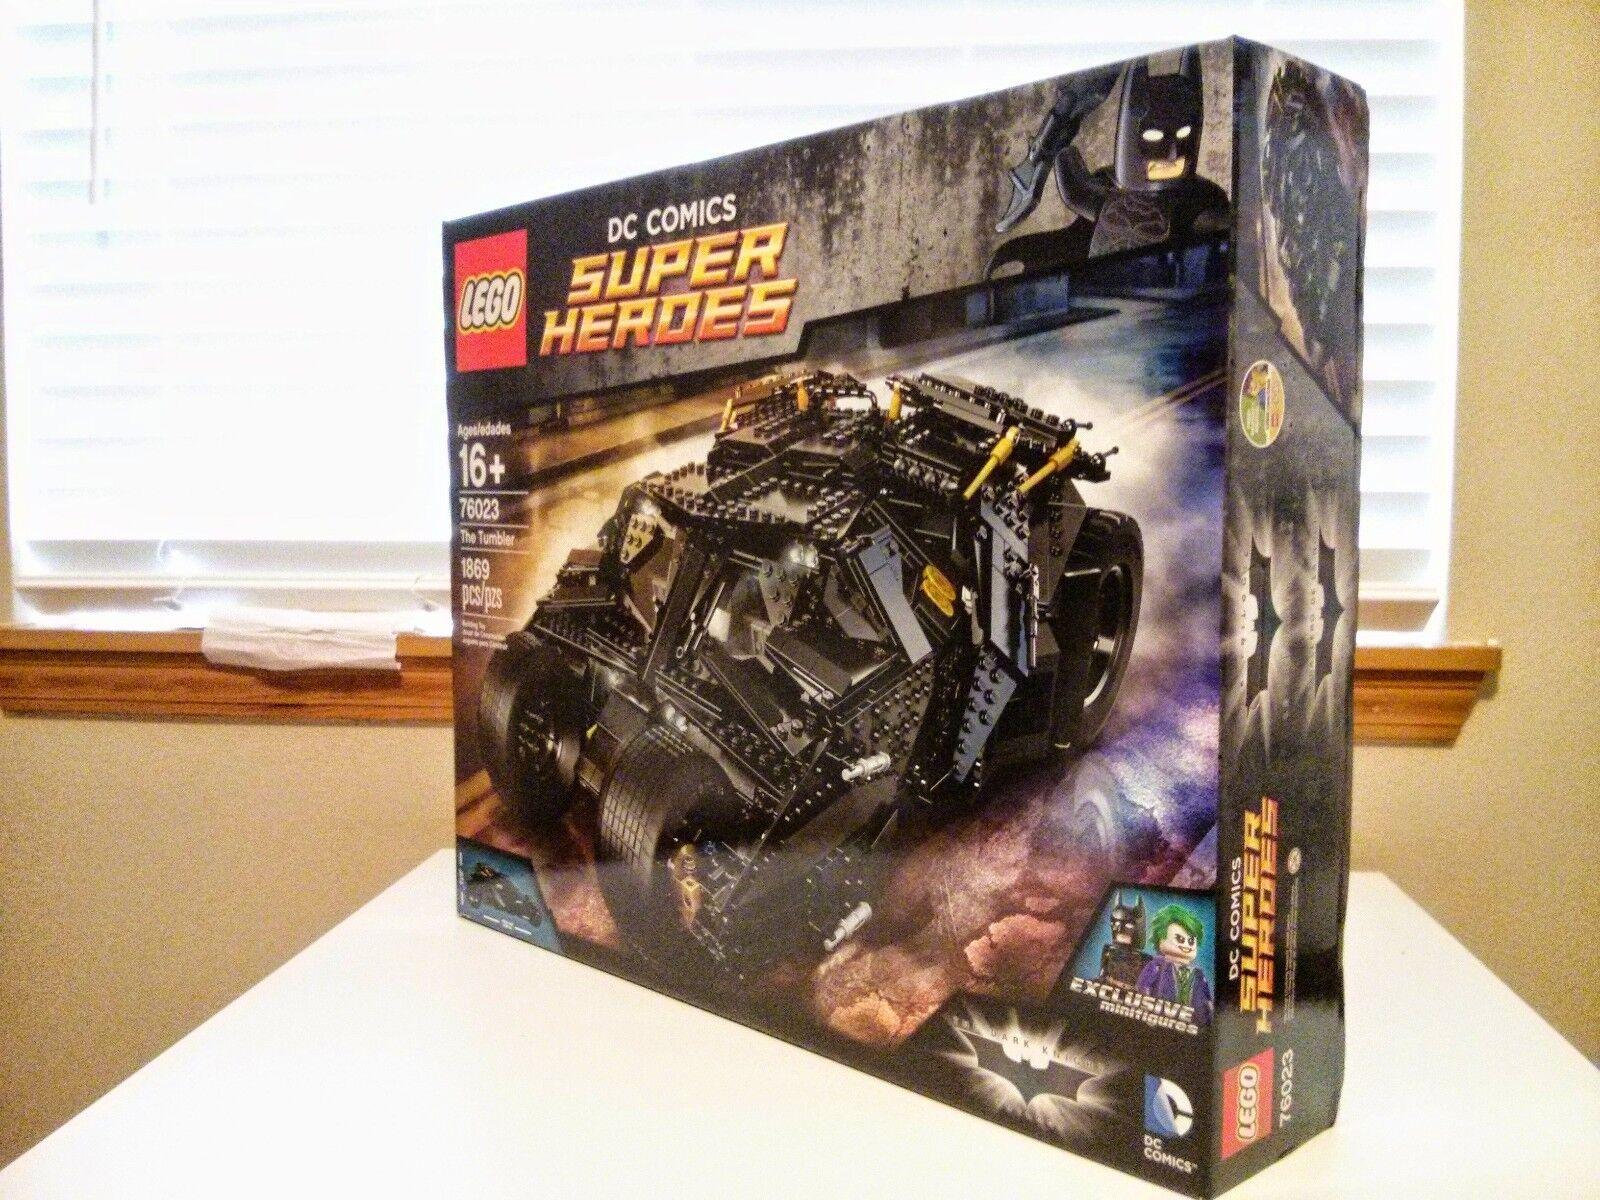 LEGO Batman Batman Batman The Tumbler 76023 DC Comics New Factory Sealed Joker Dark Knight b22a79